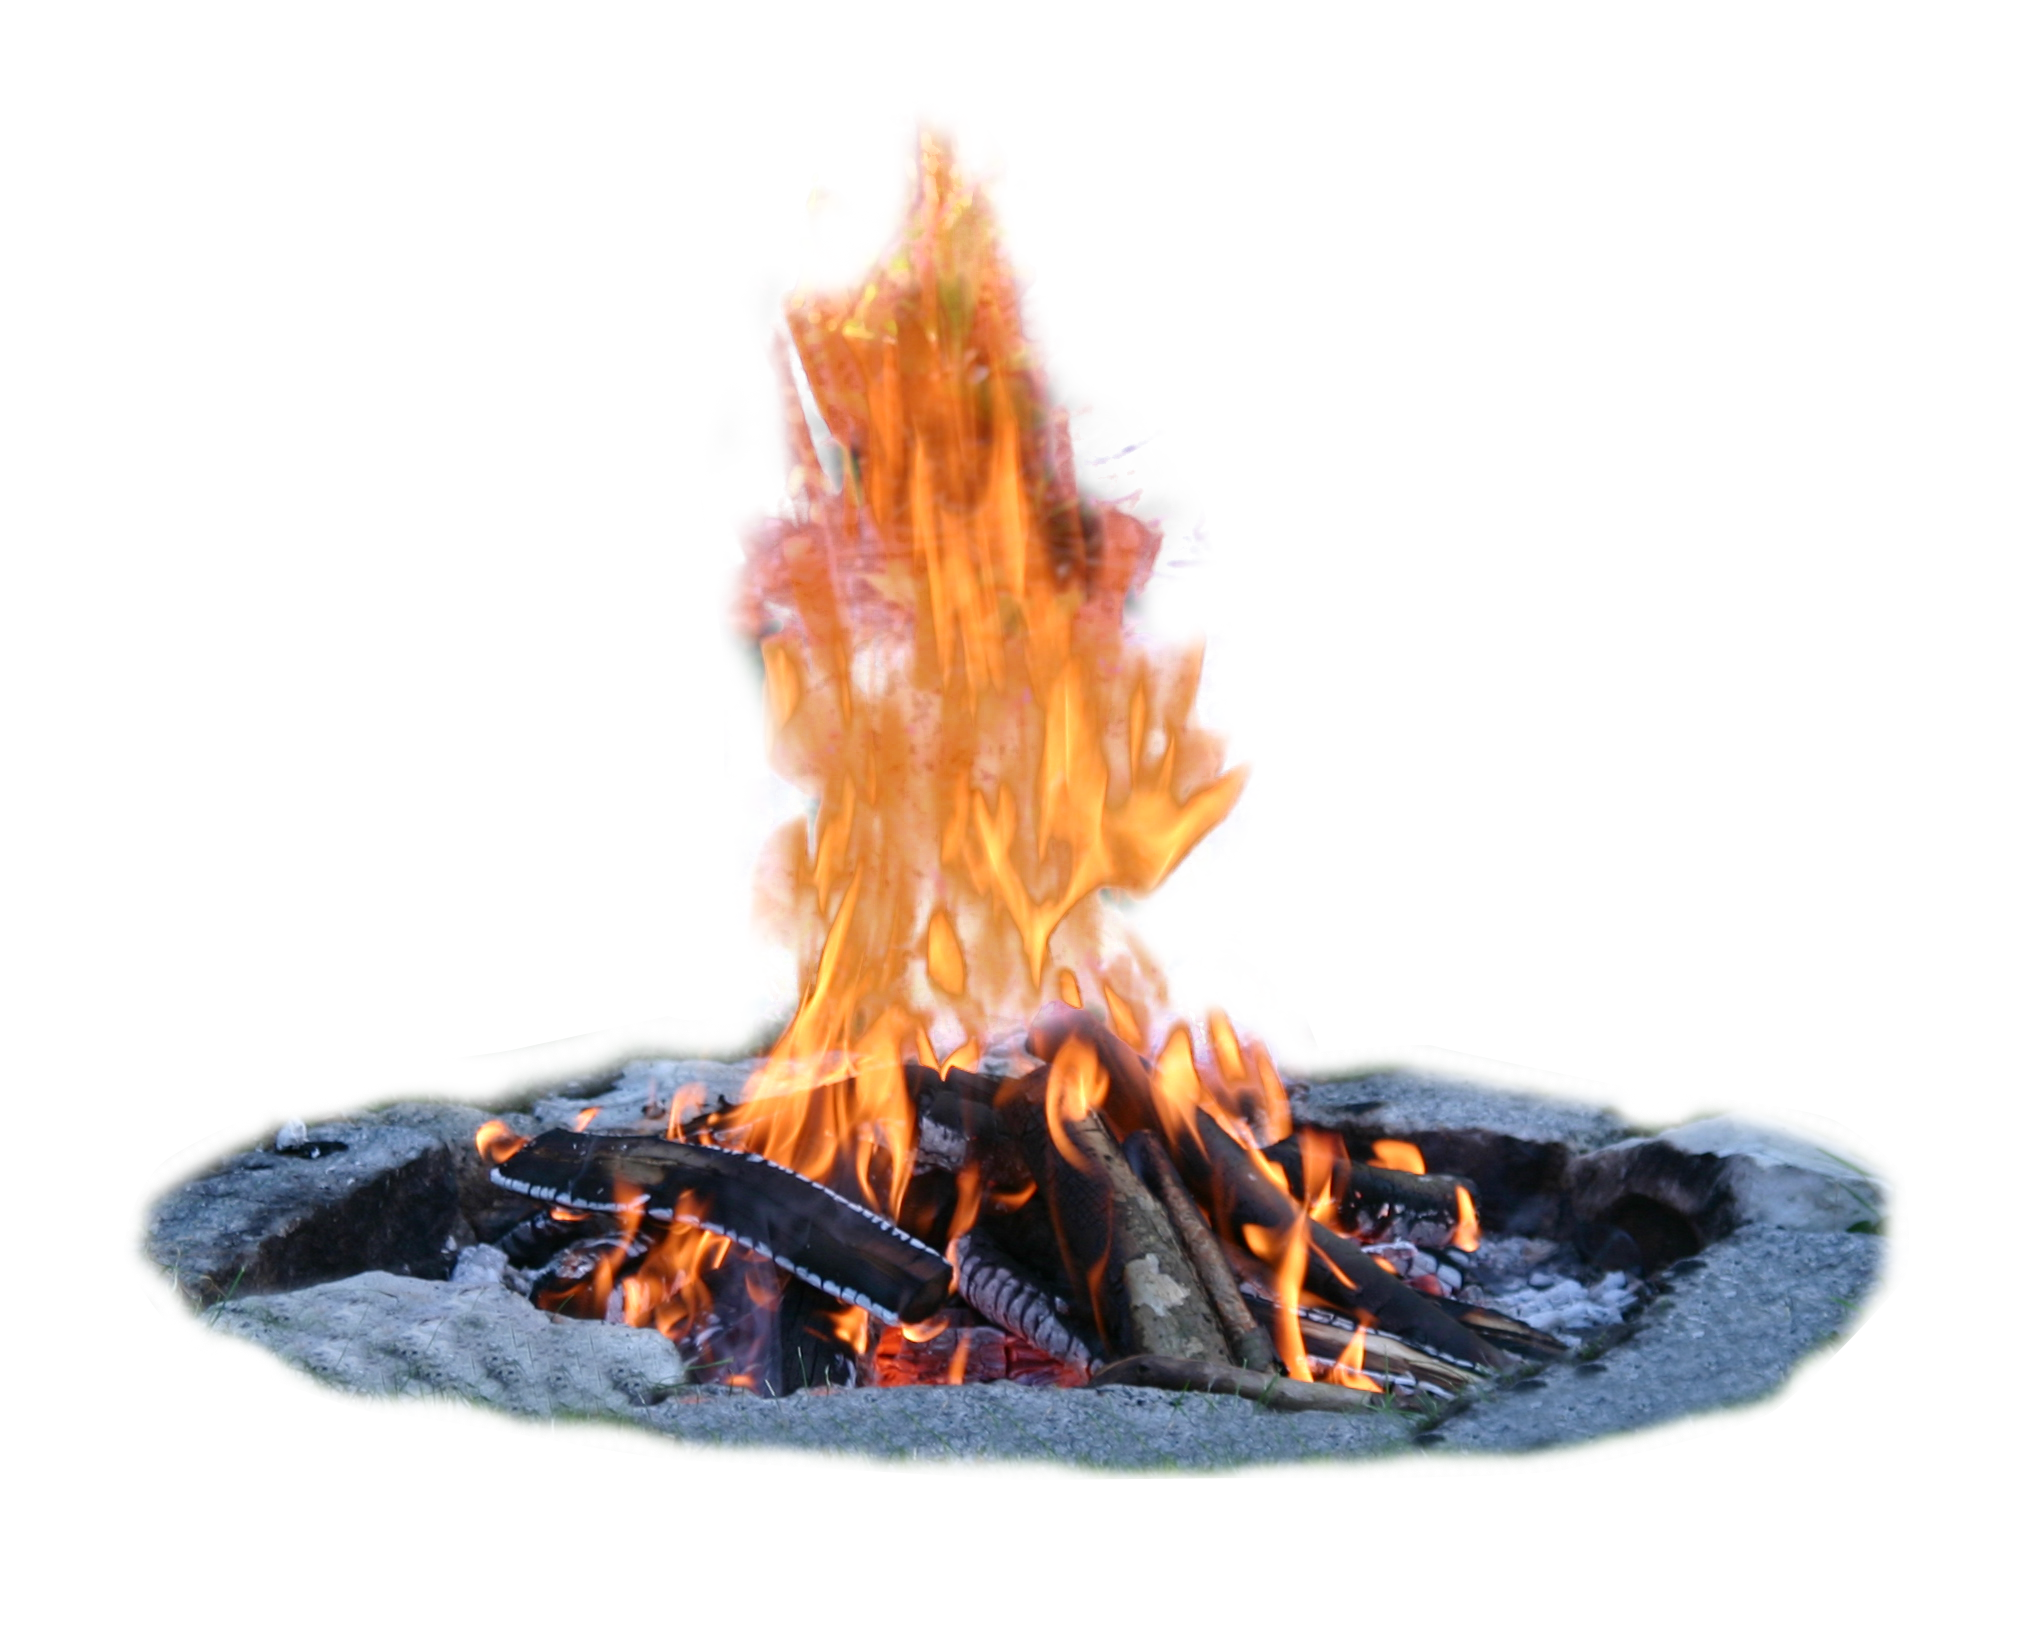 Big Explosion Png Png Image Purepng: Campfire PNG Image - PurePNG